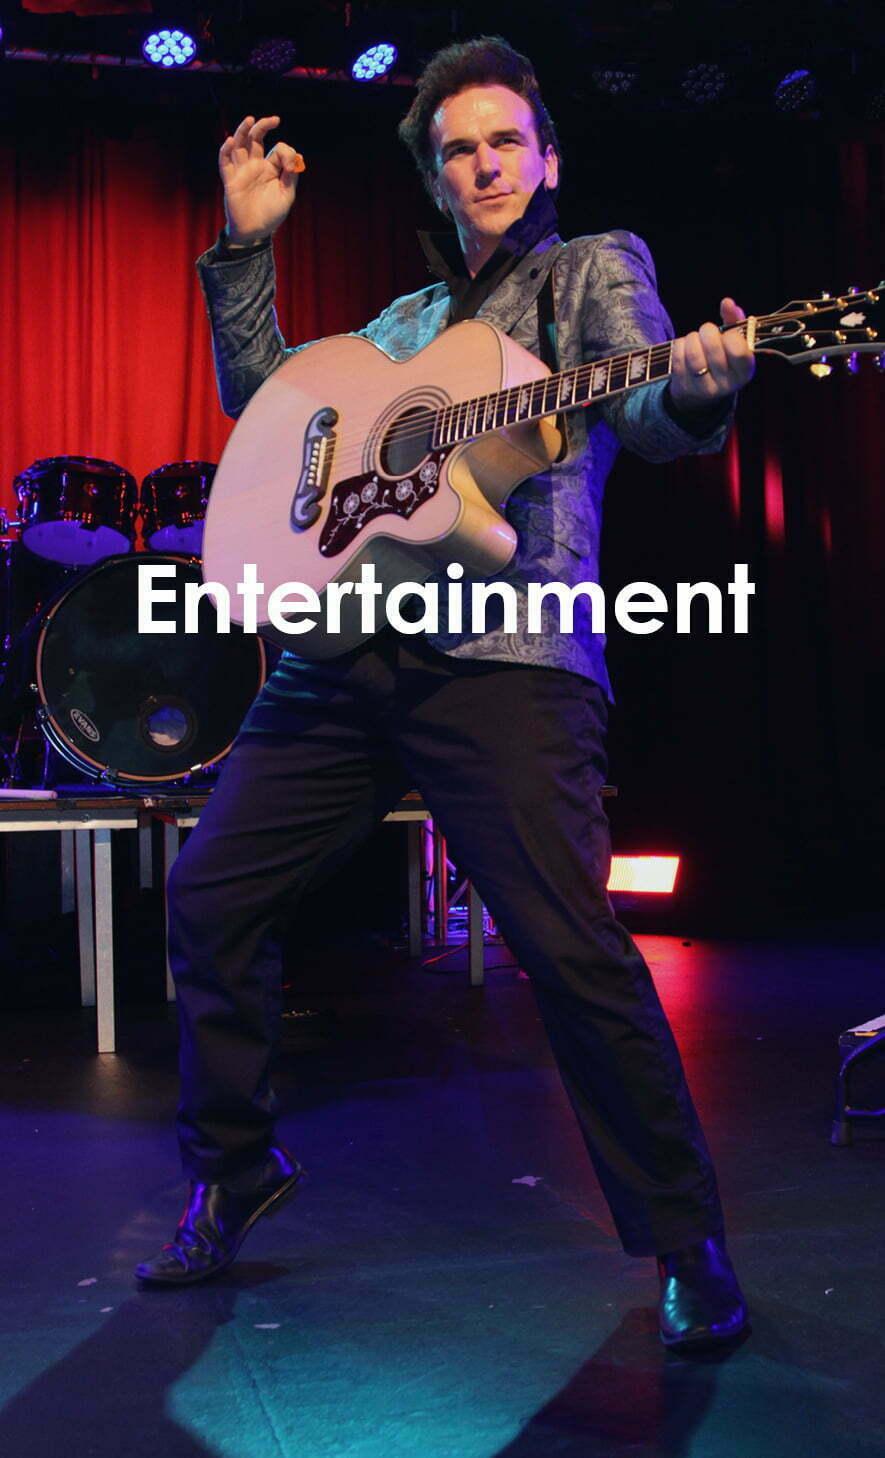 Entertainment Free Live Caloundra RSL Gig Concert Music